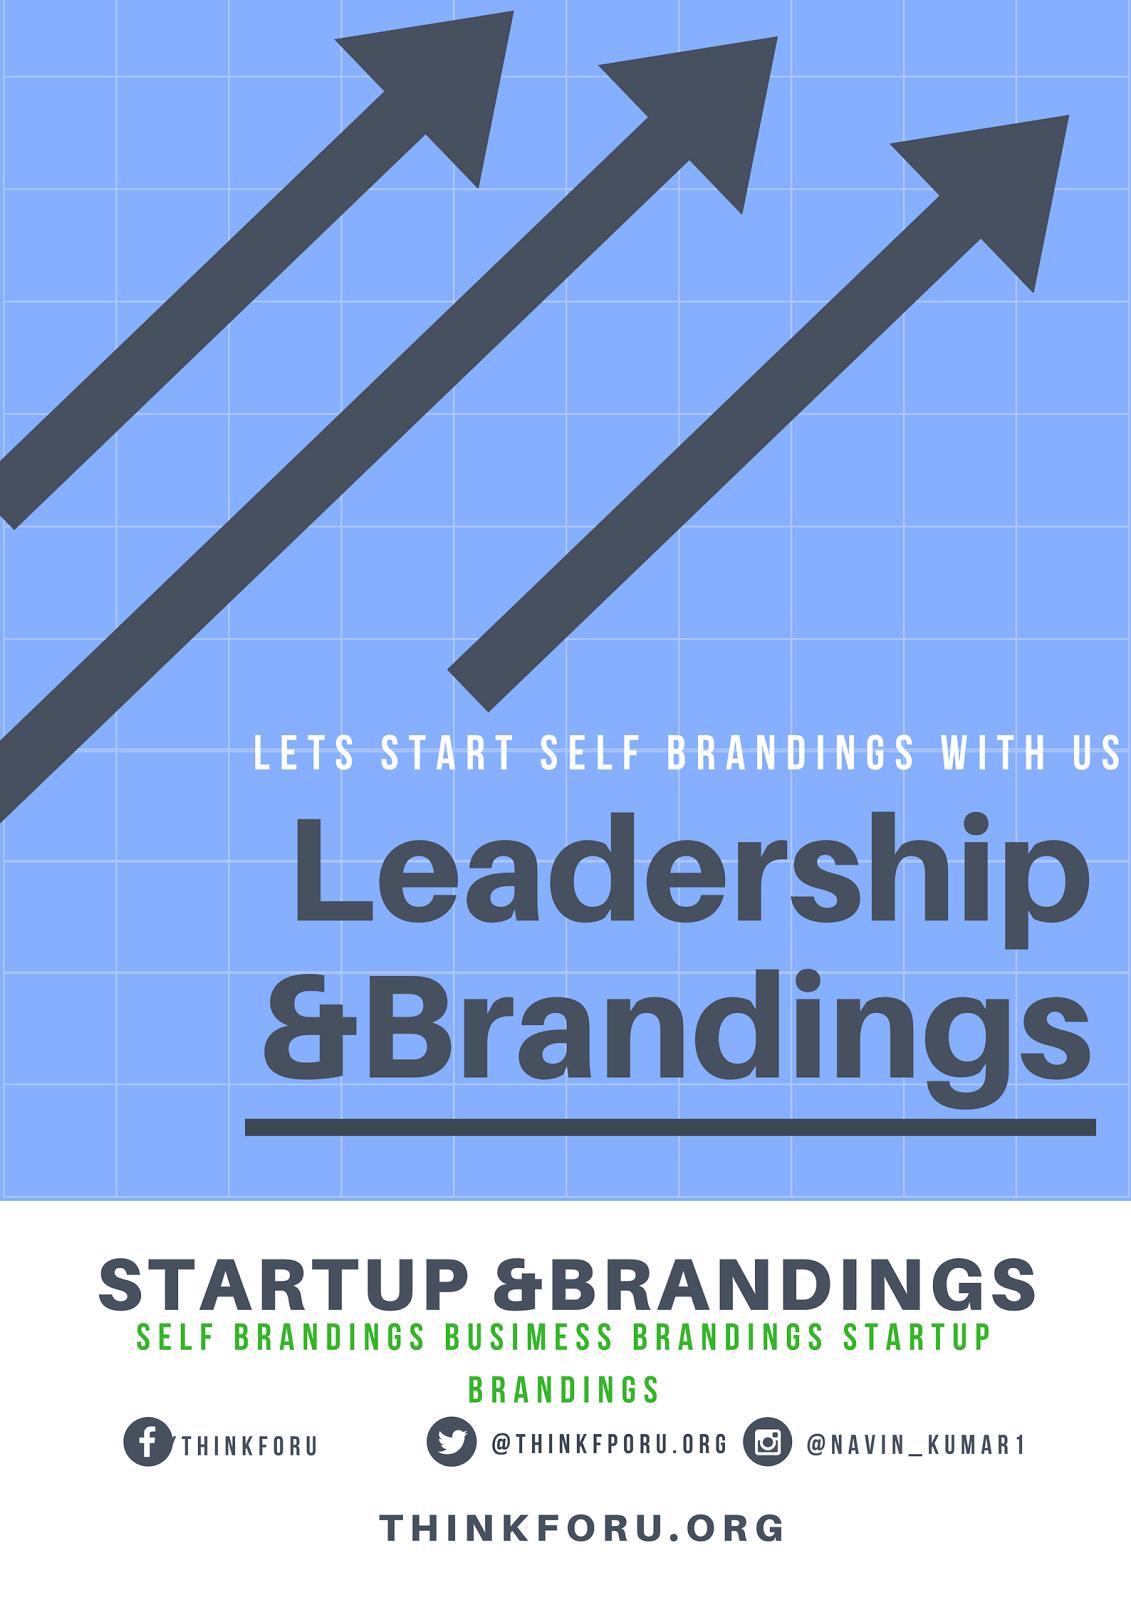 Self Branding with us